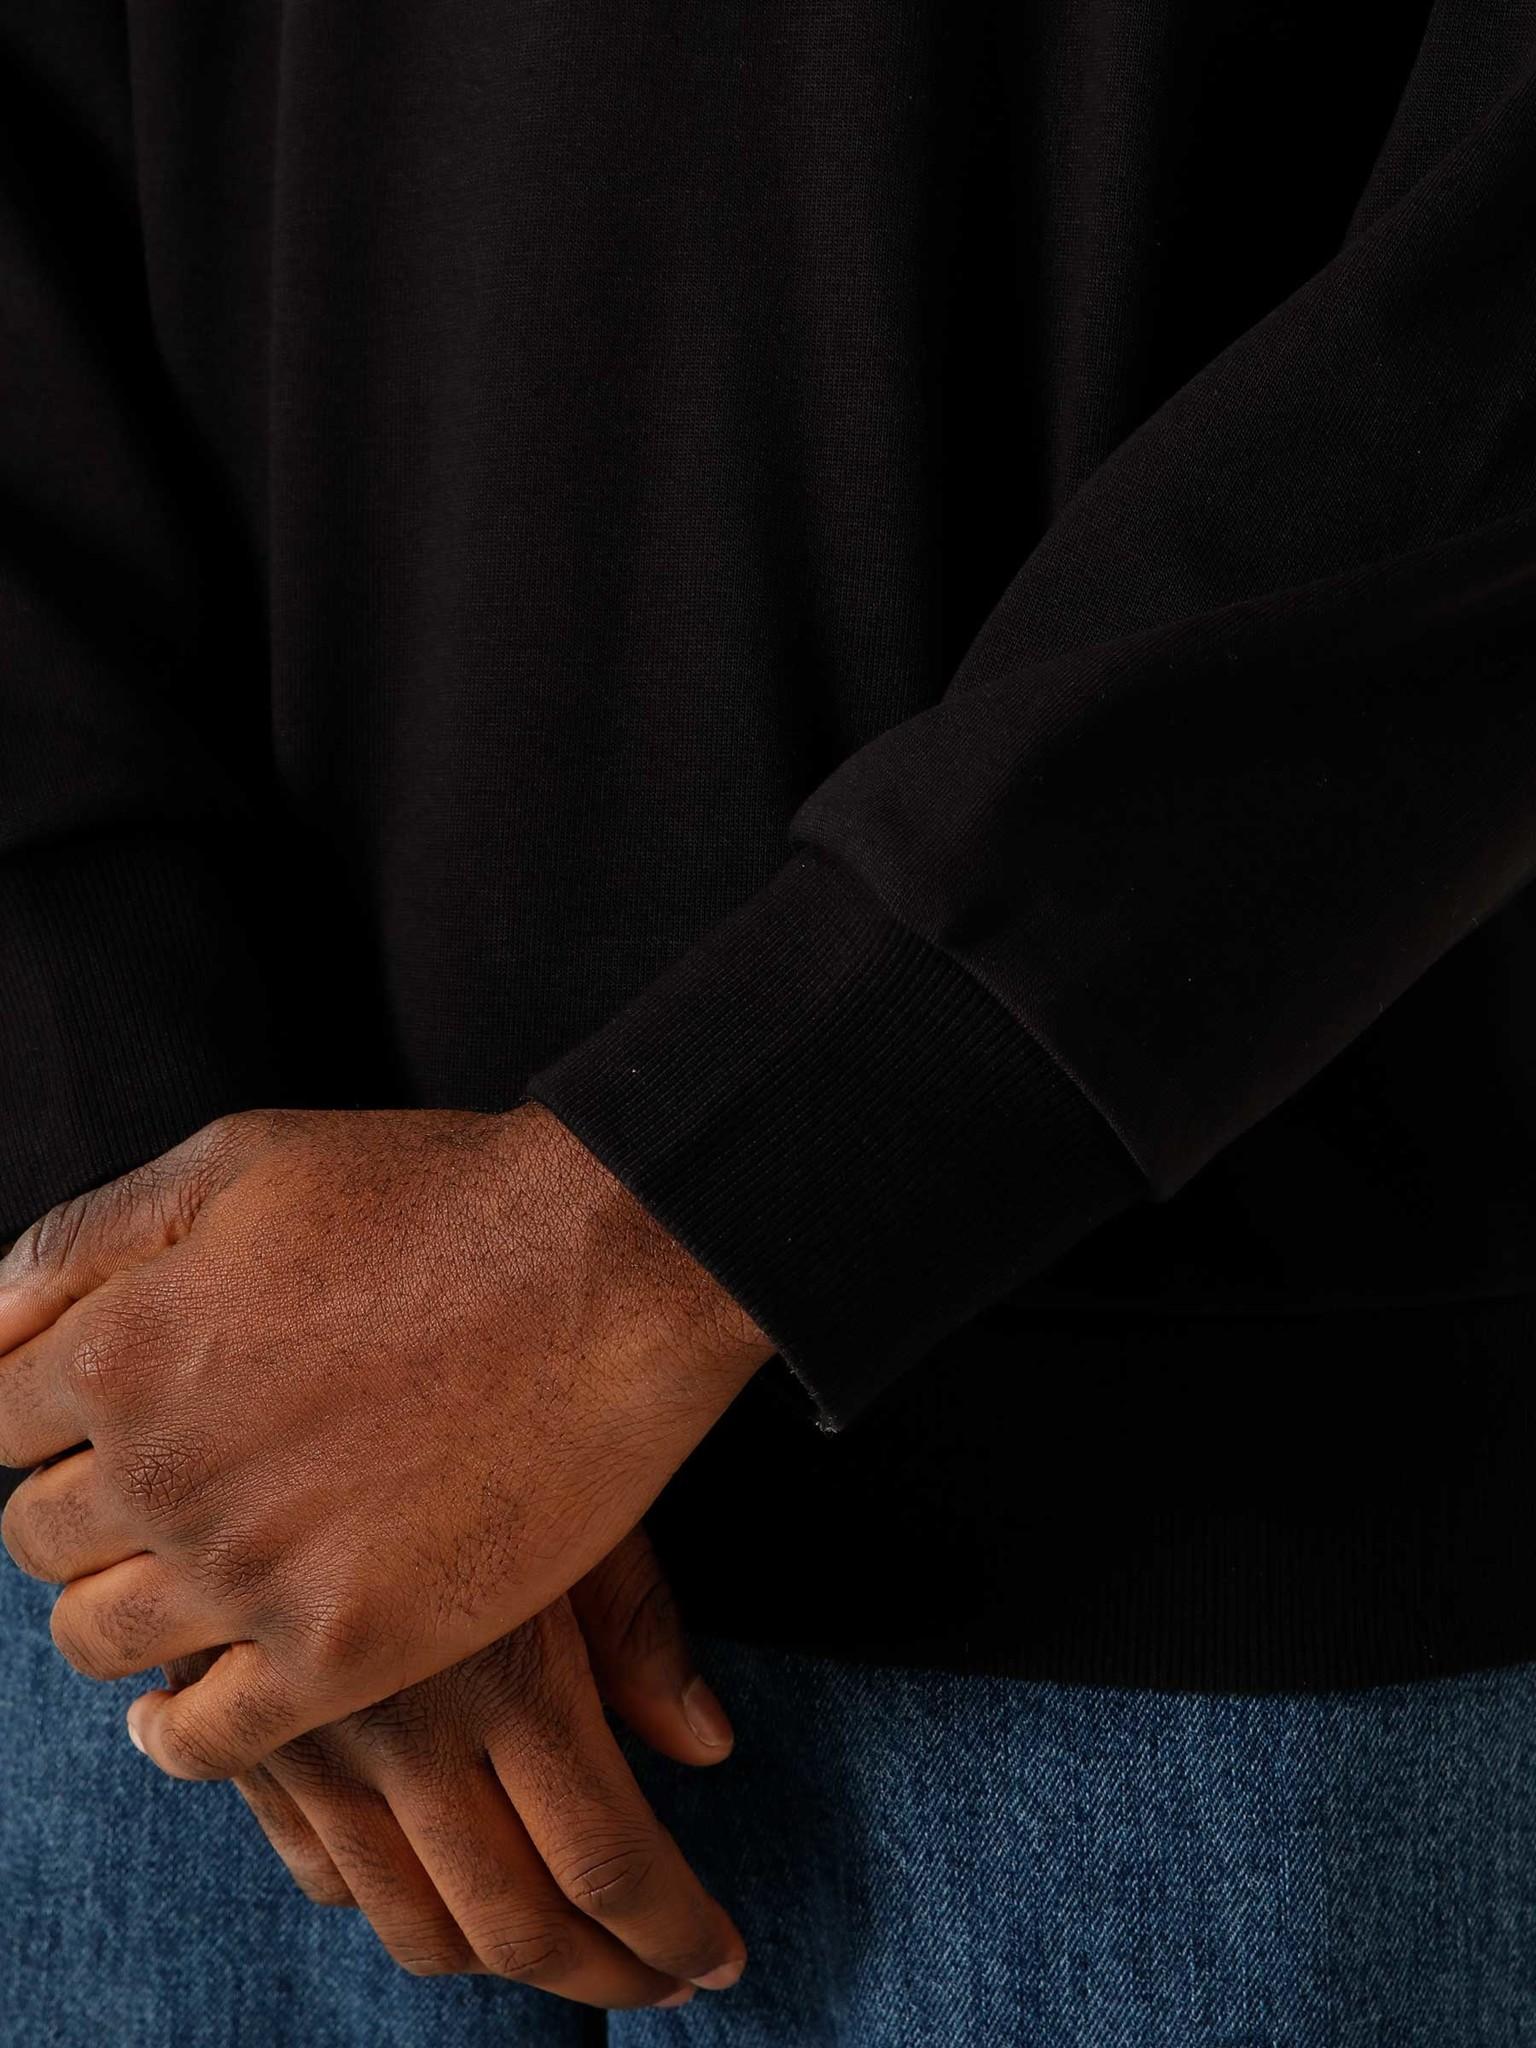 Carhartt WIP Carhartt WIP Wavy State Sweat Black White I028984-8990